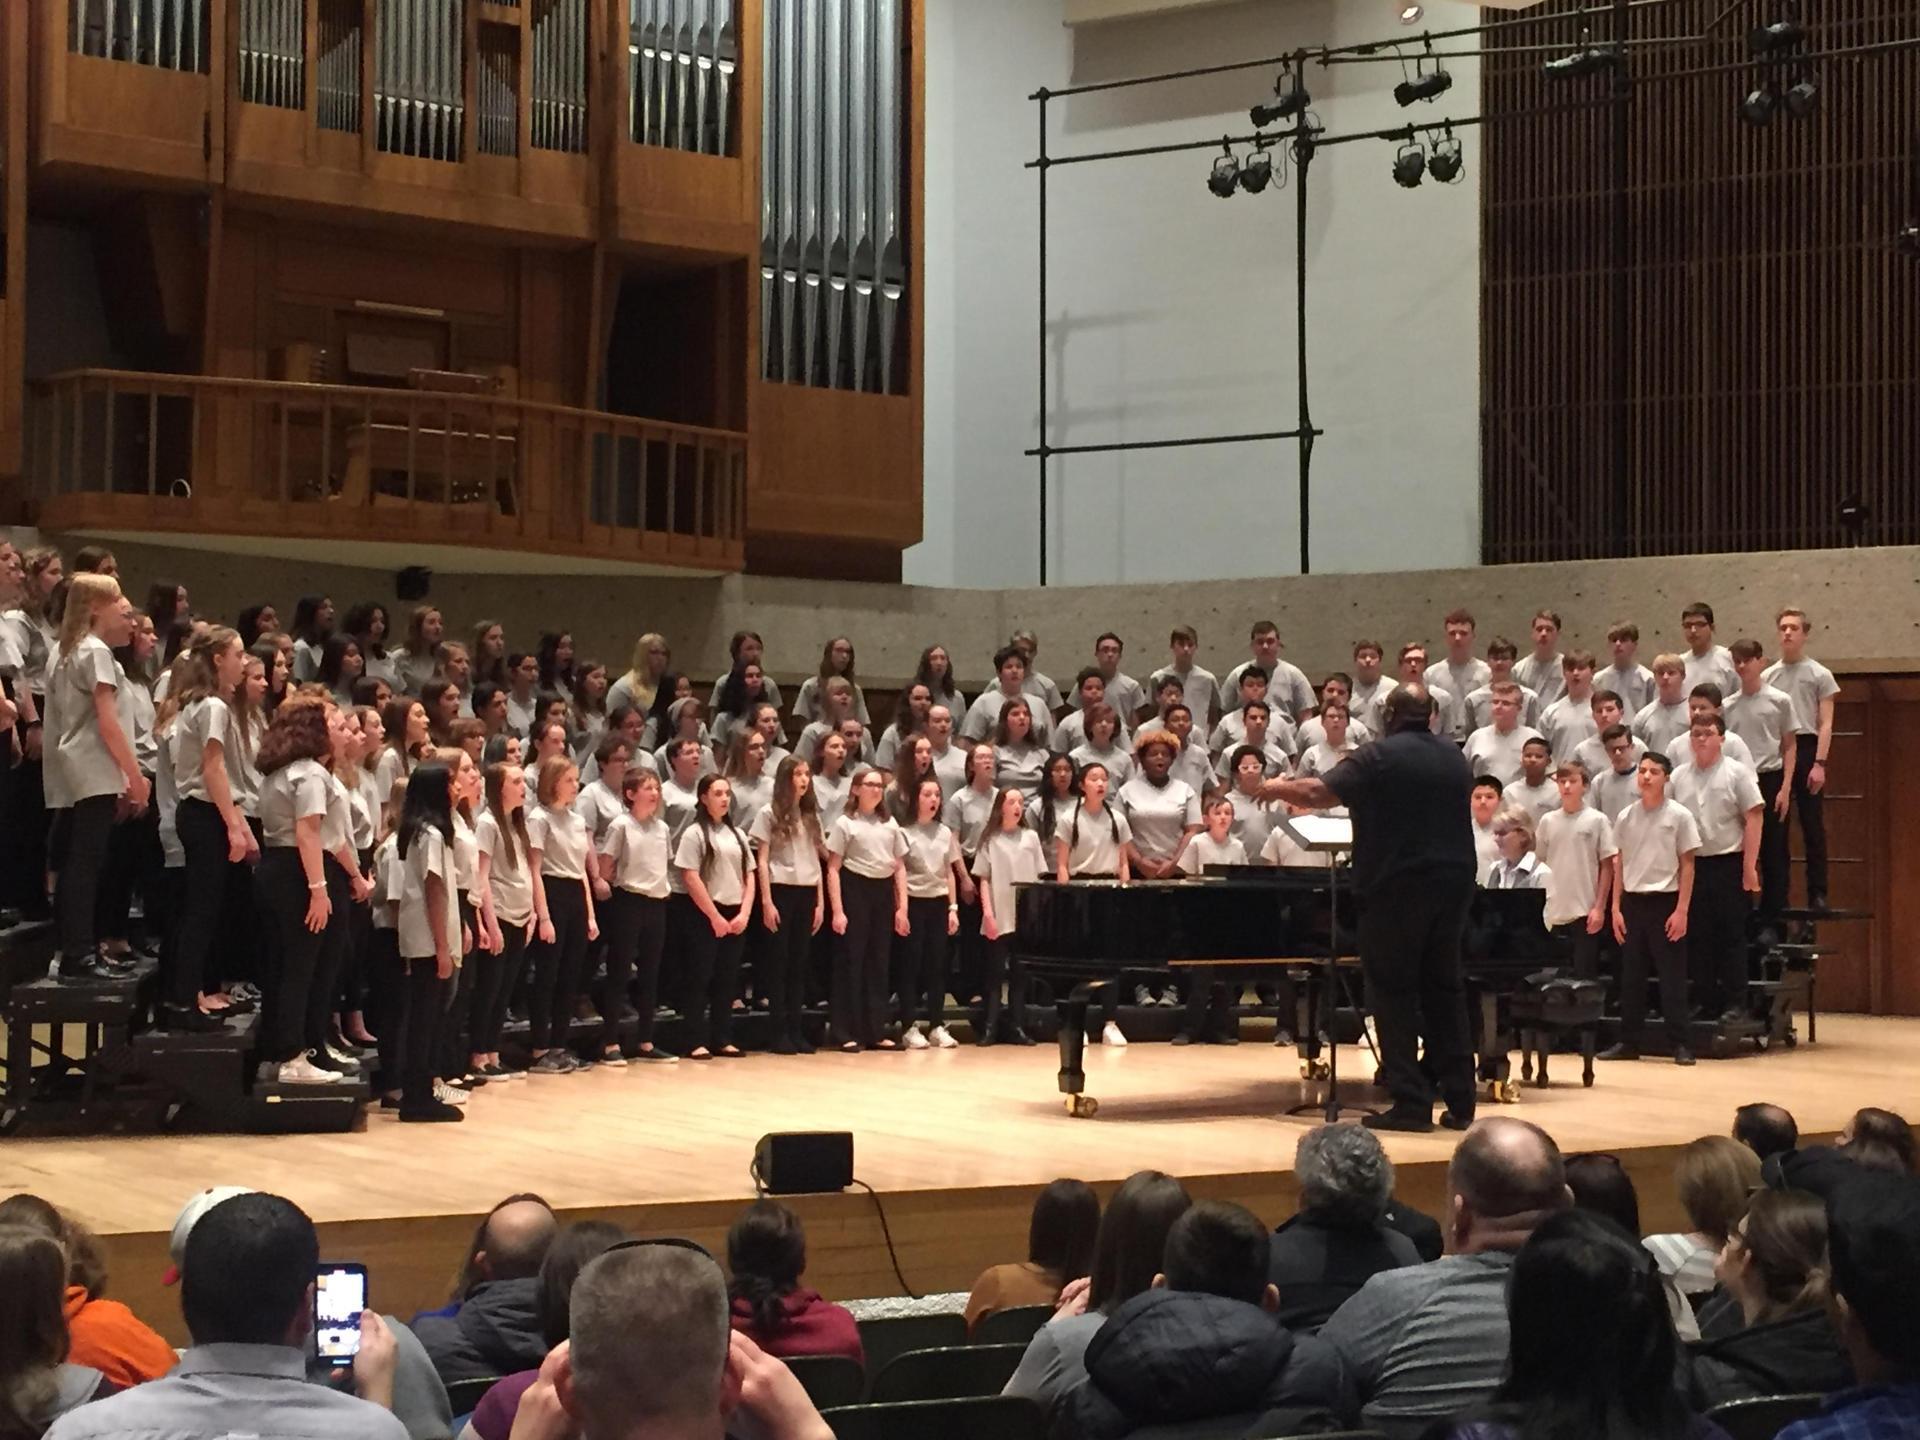 UNO Honor Choir performance